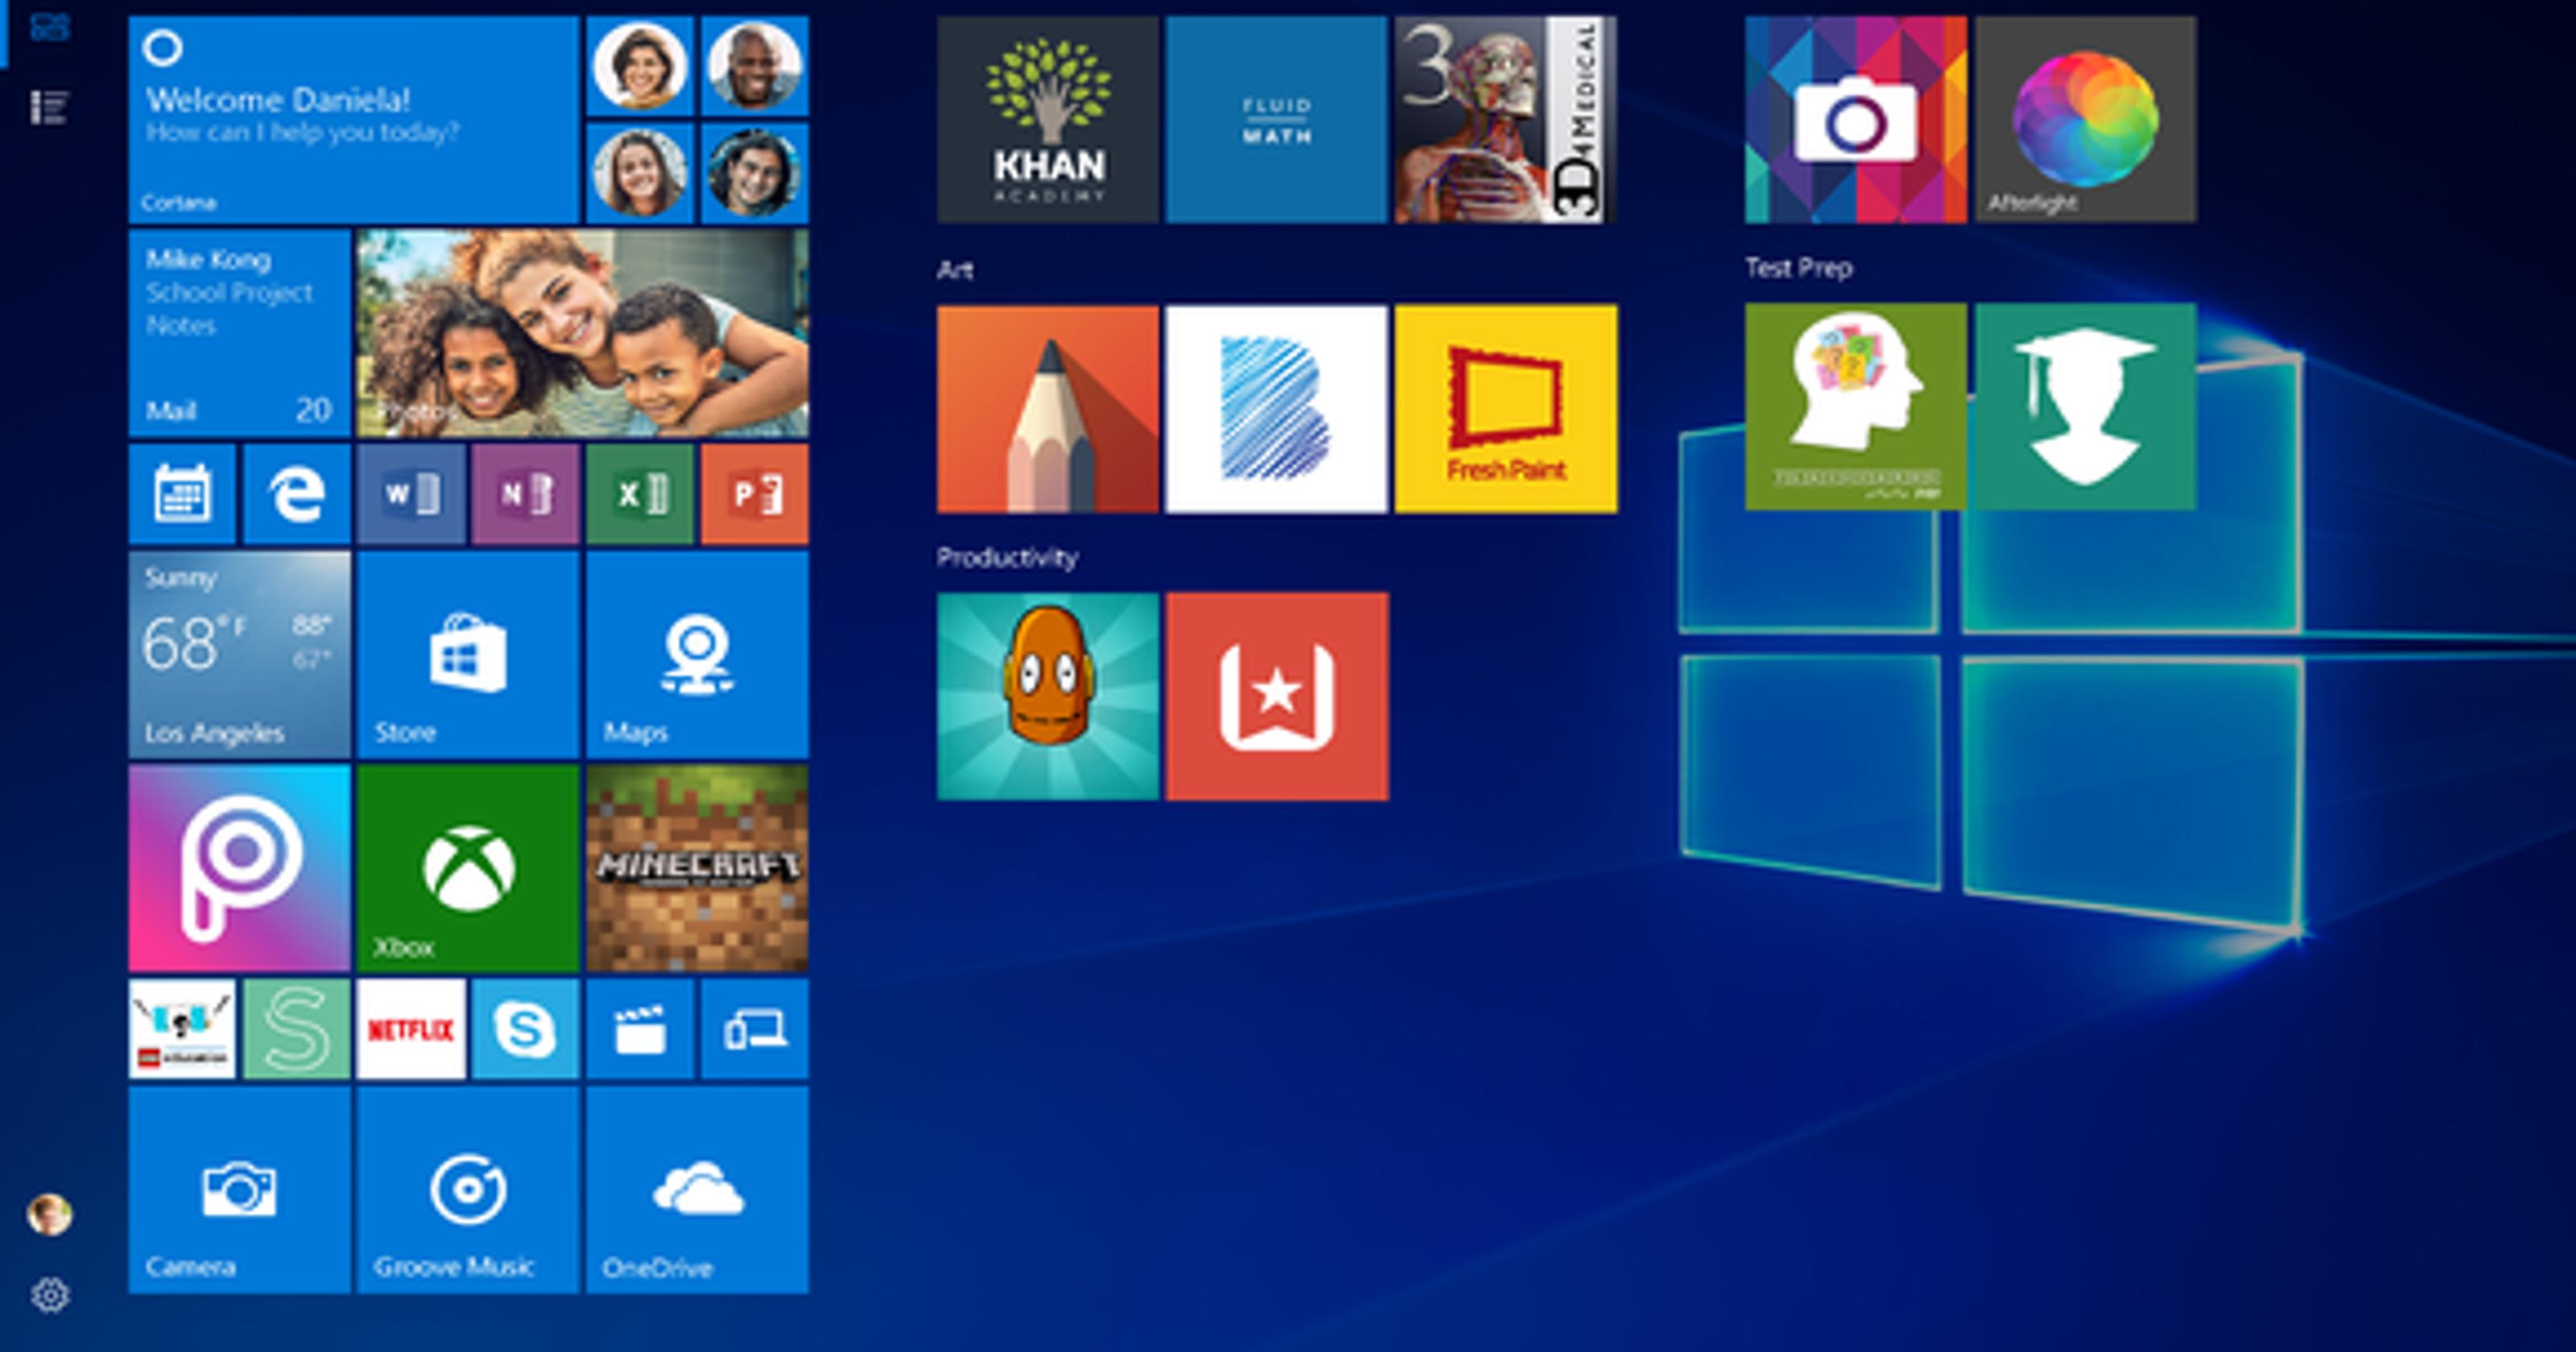 can you upgrade windows 7 to windows 10 2019